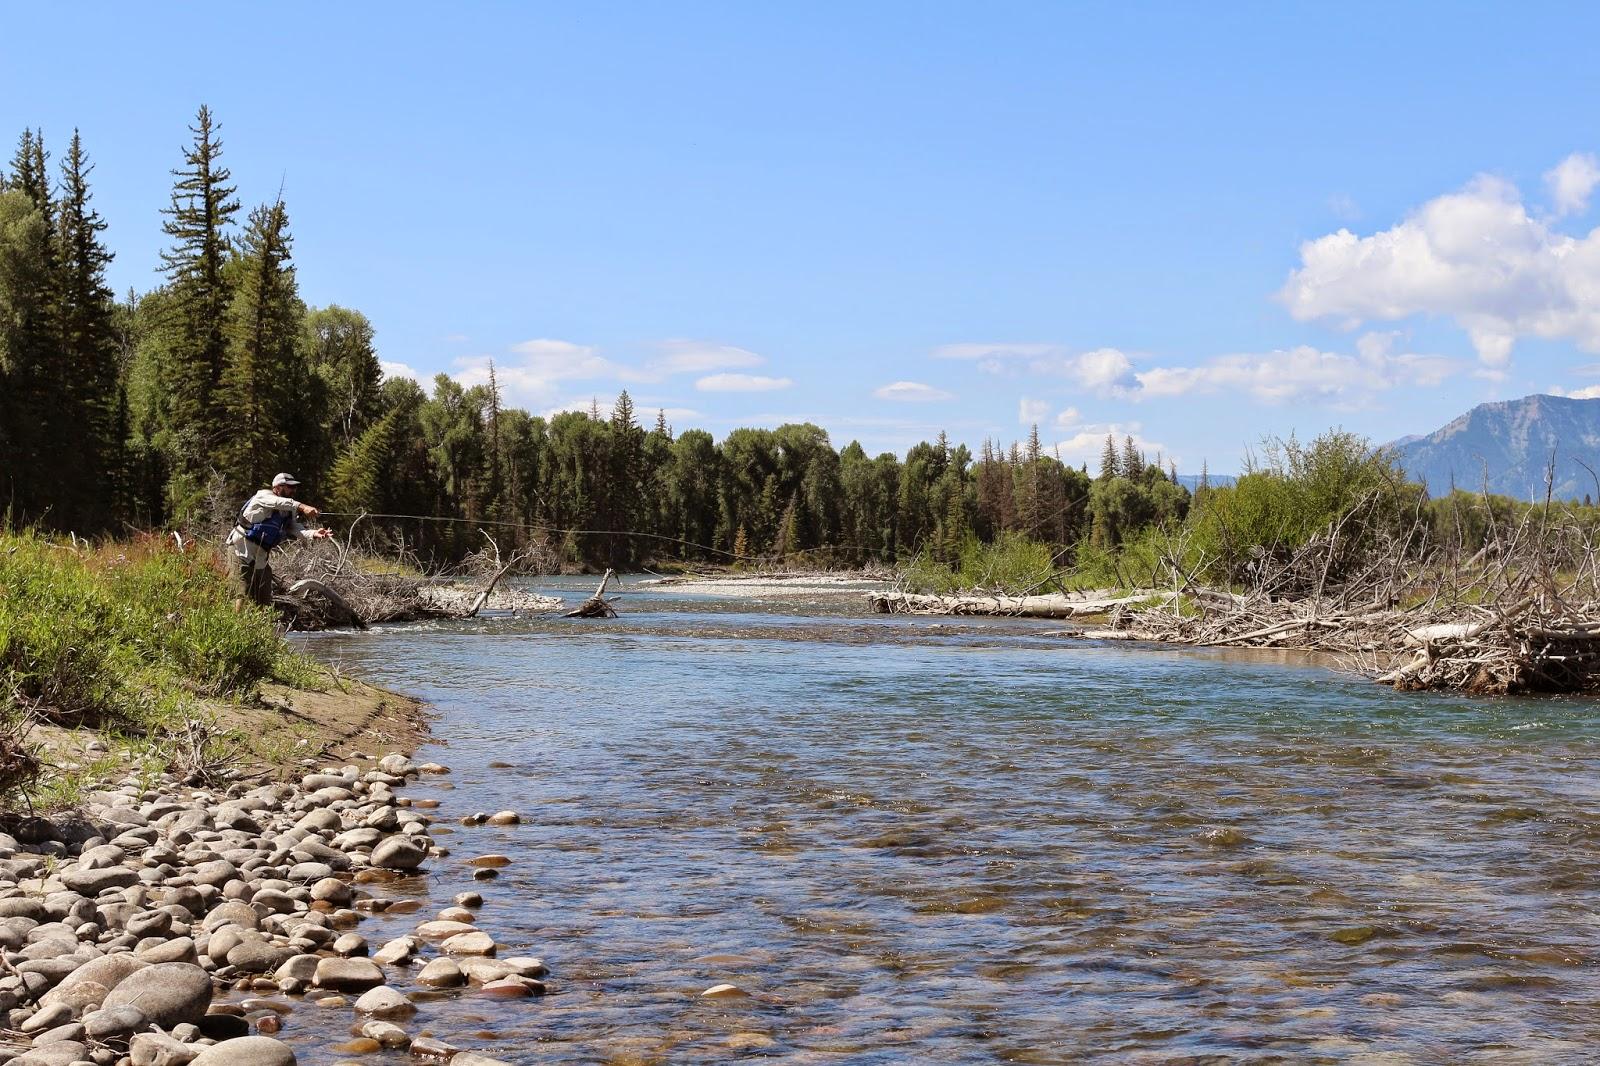 Jay scott outdoors jackson hole wyoming pics 8 for Snake river fly fishing